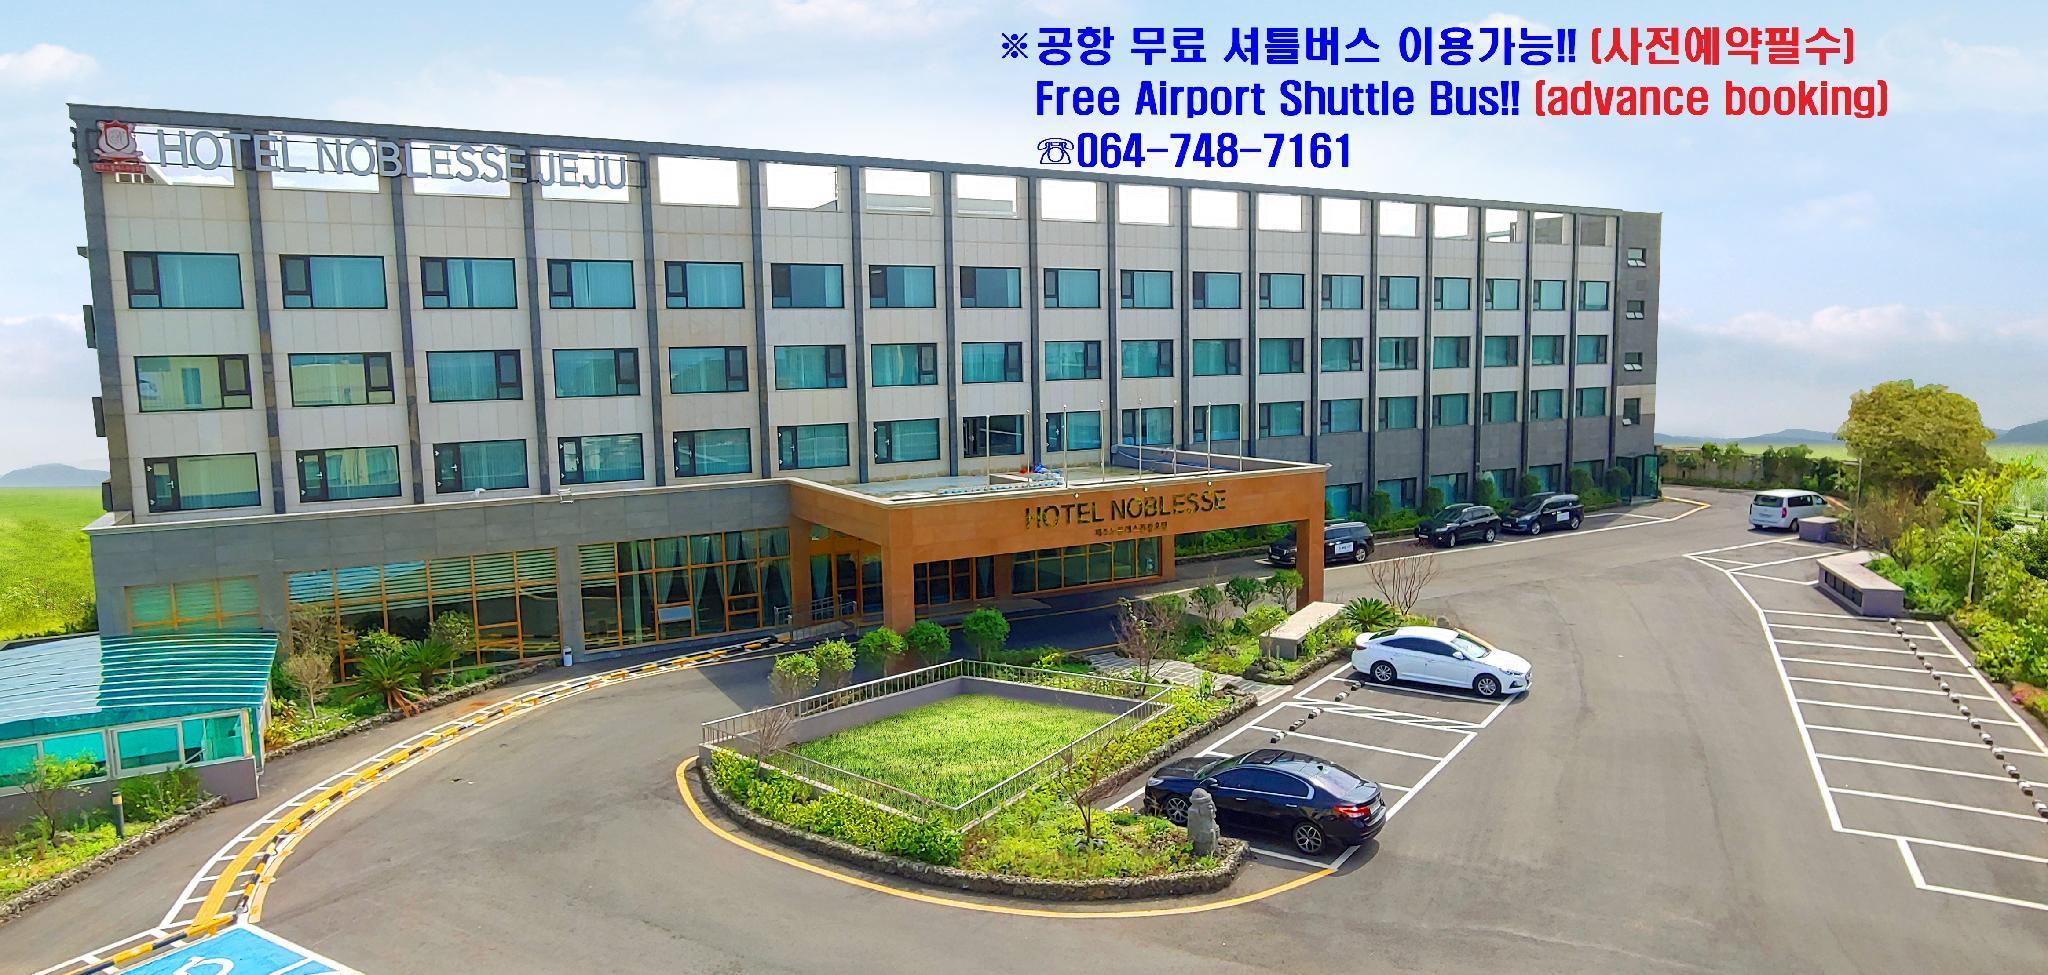 Hotel Noblesse Jeju